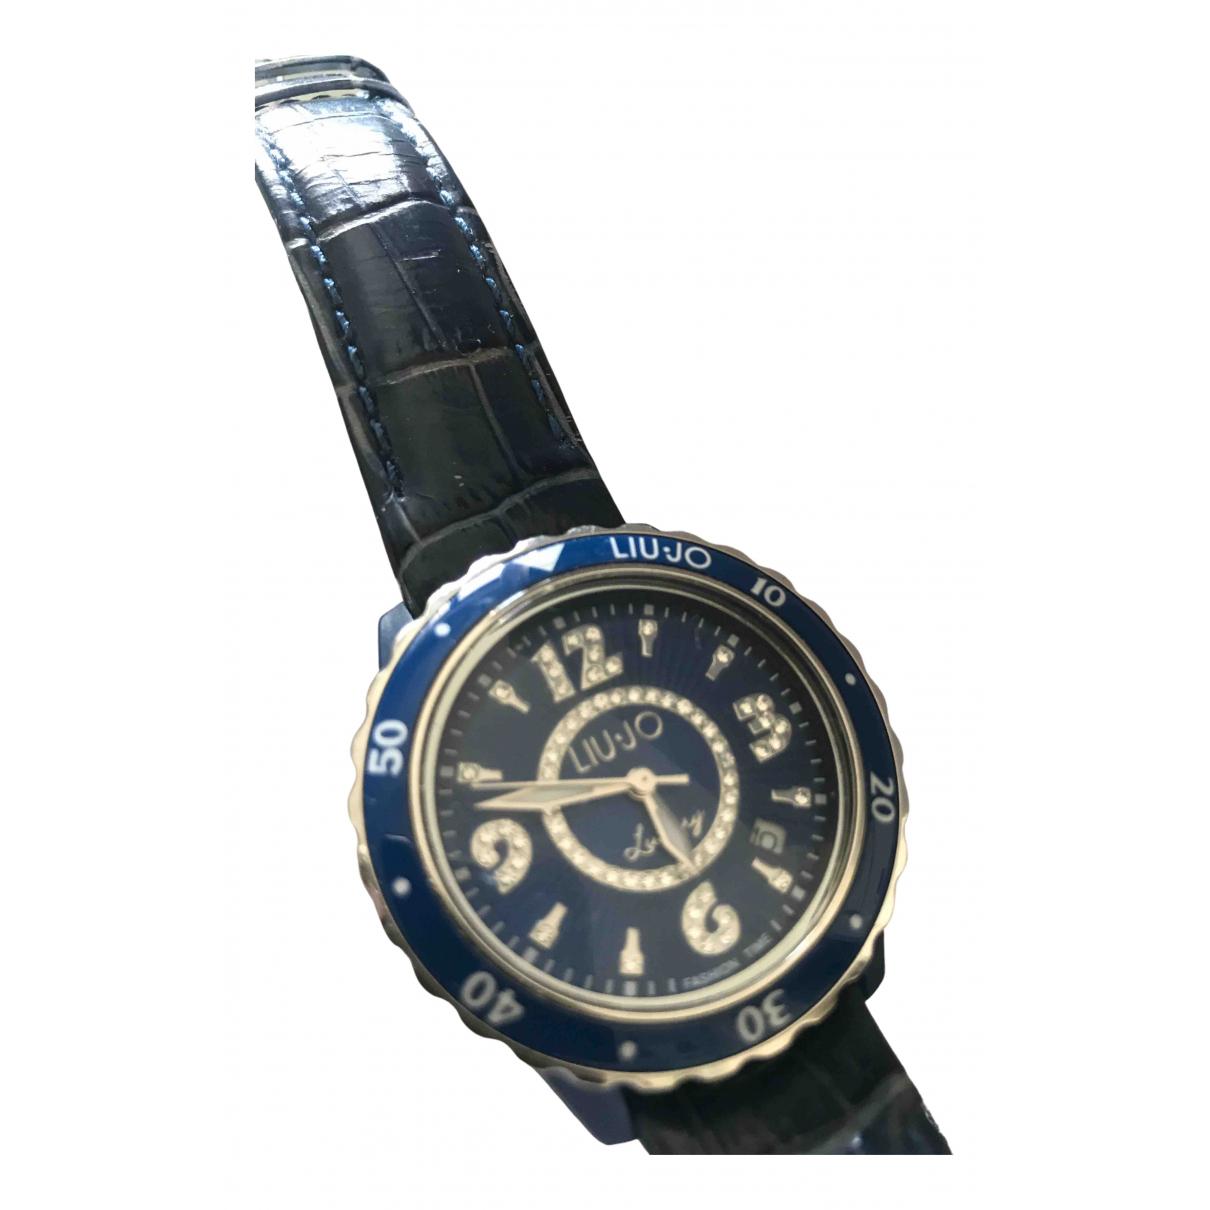 Reloj Liu.jo